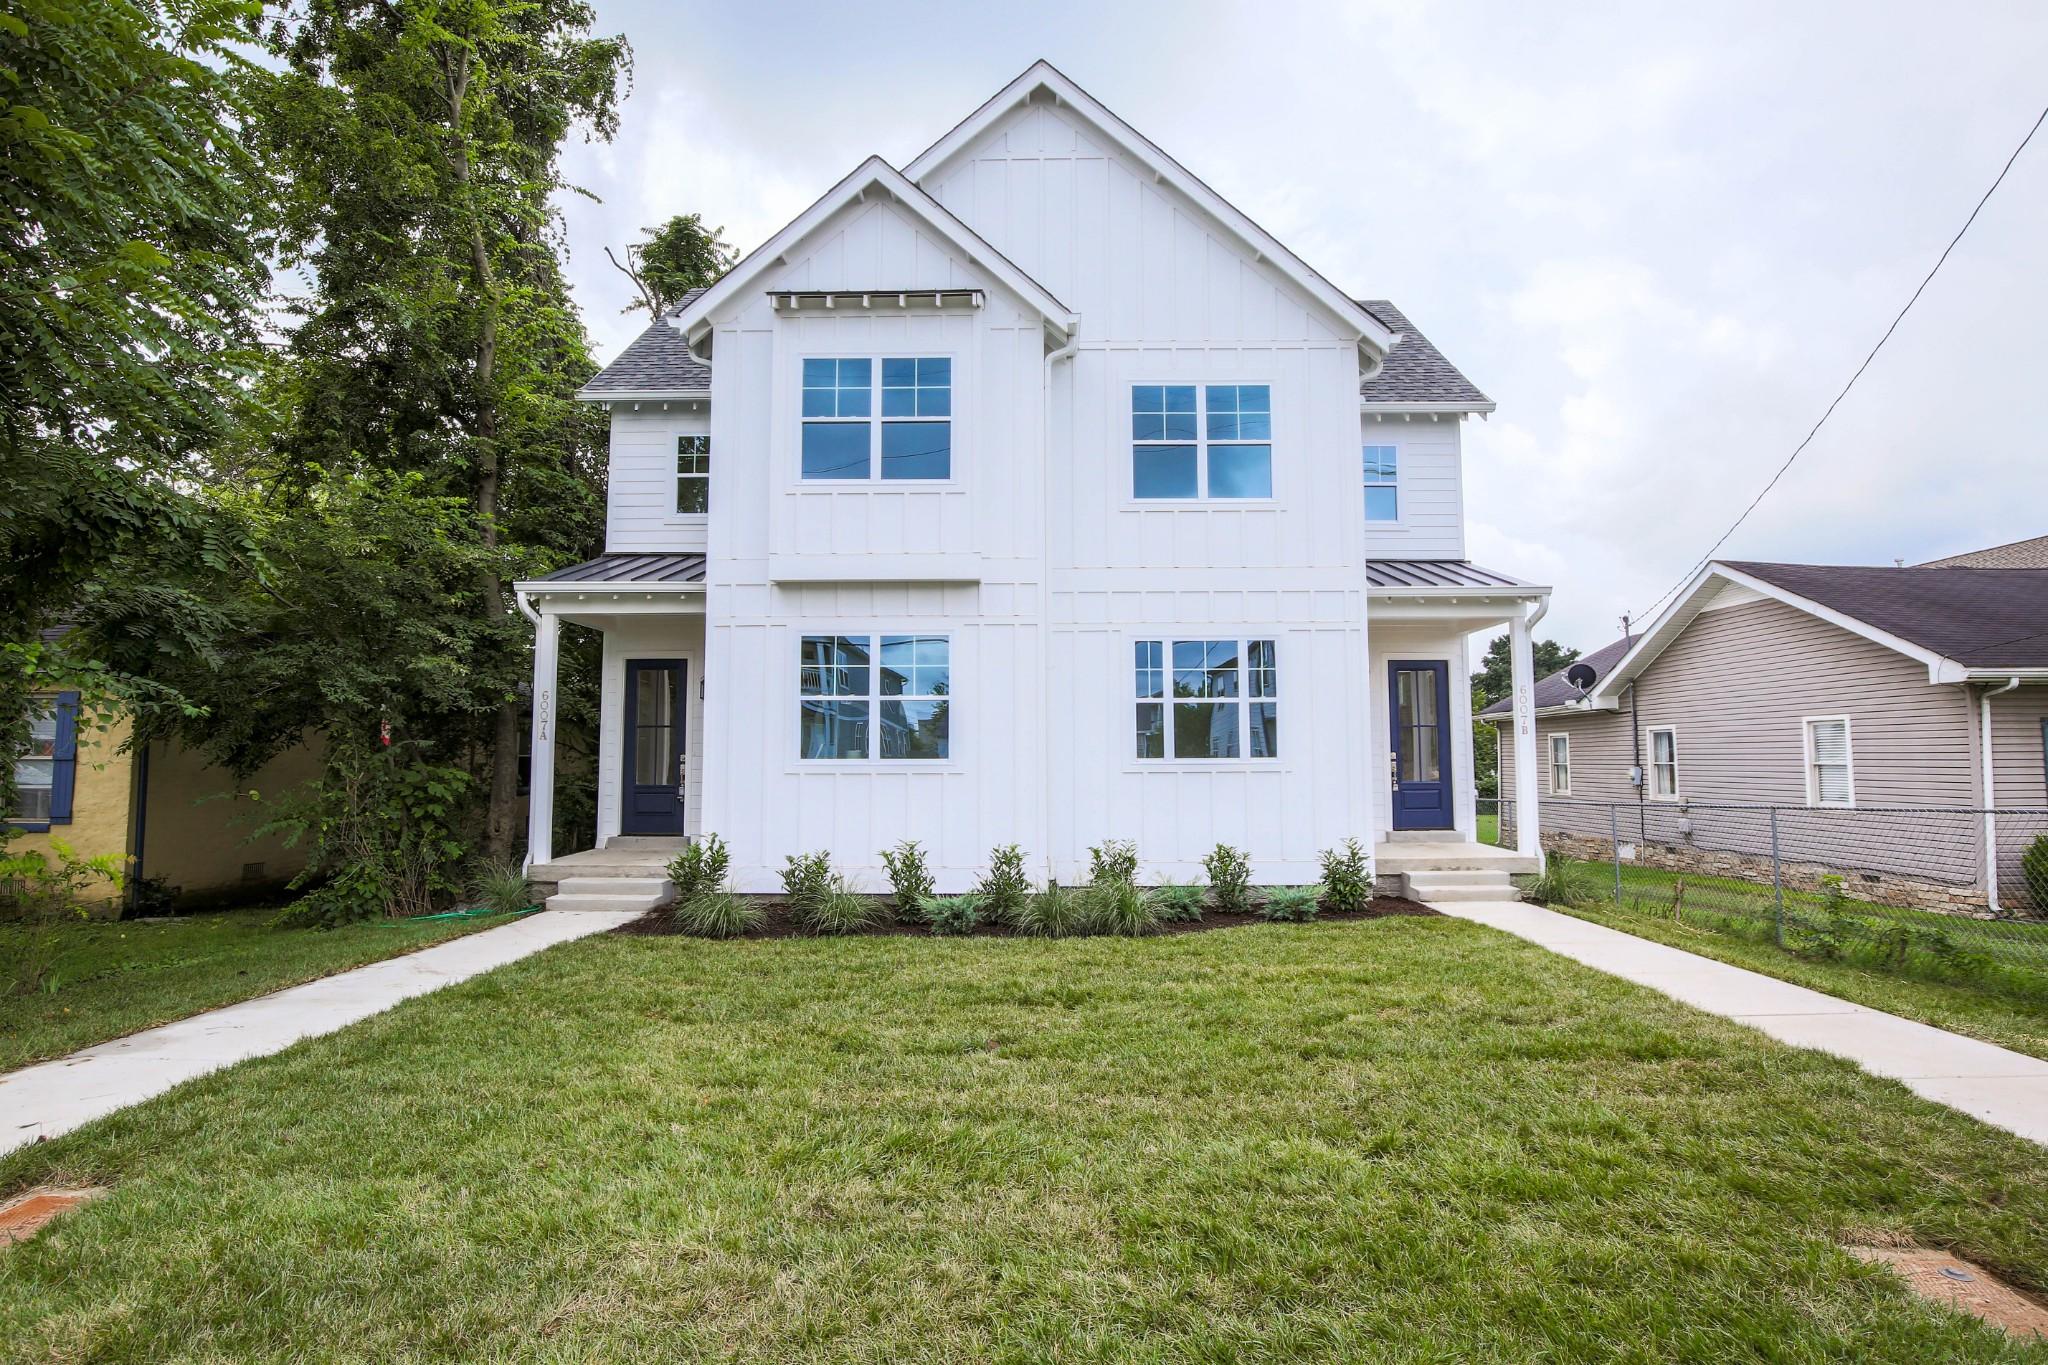 6007A California Ave Property Photo - Nashville, TN real estate listing